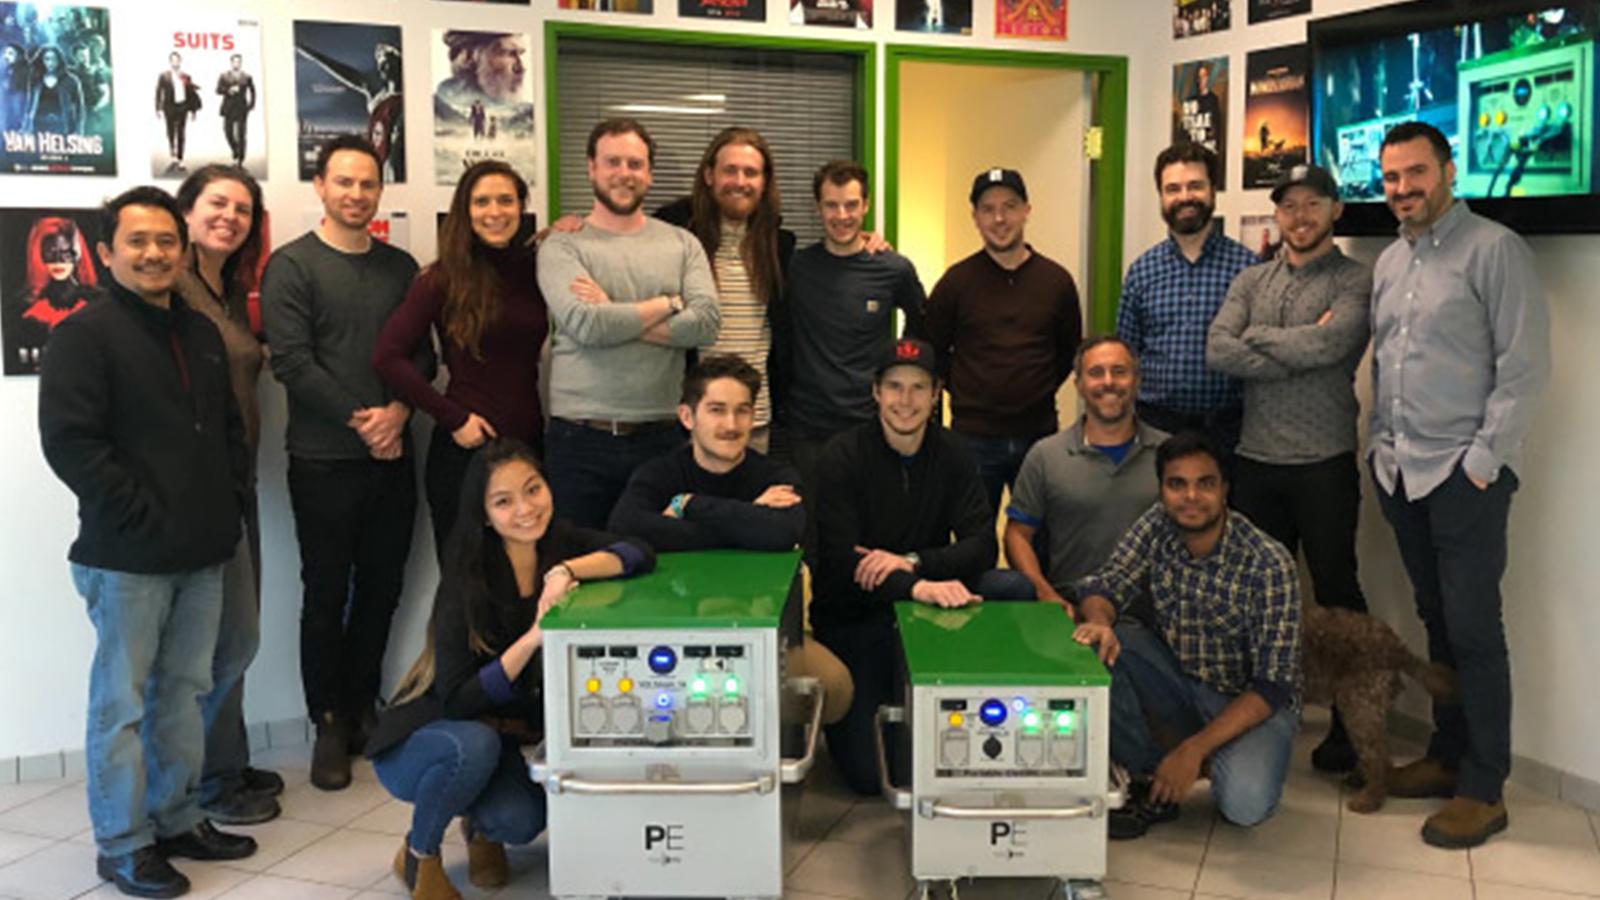 Vancouver cleantech providing life-saving battery power